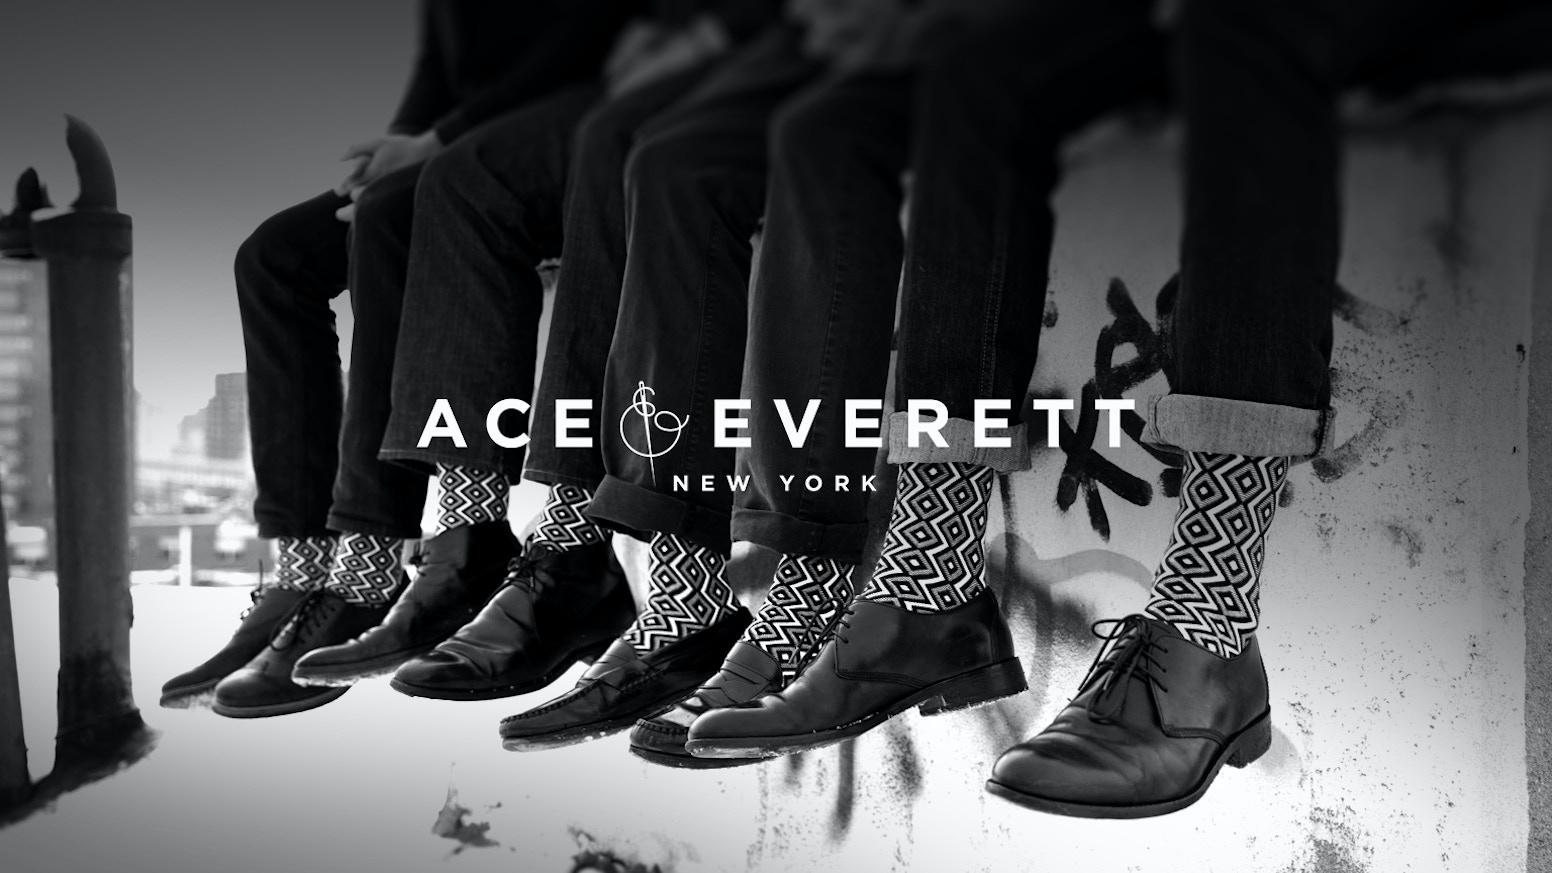 Ace & Everett: American Made Socks by Ace & Everett